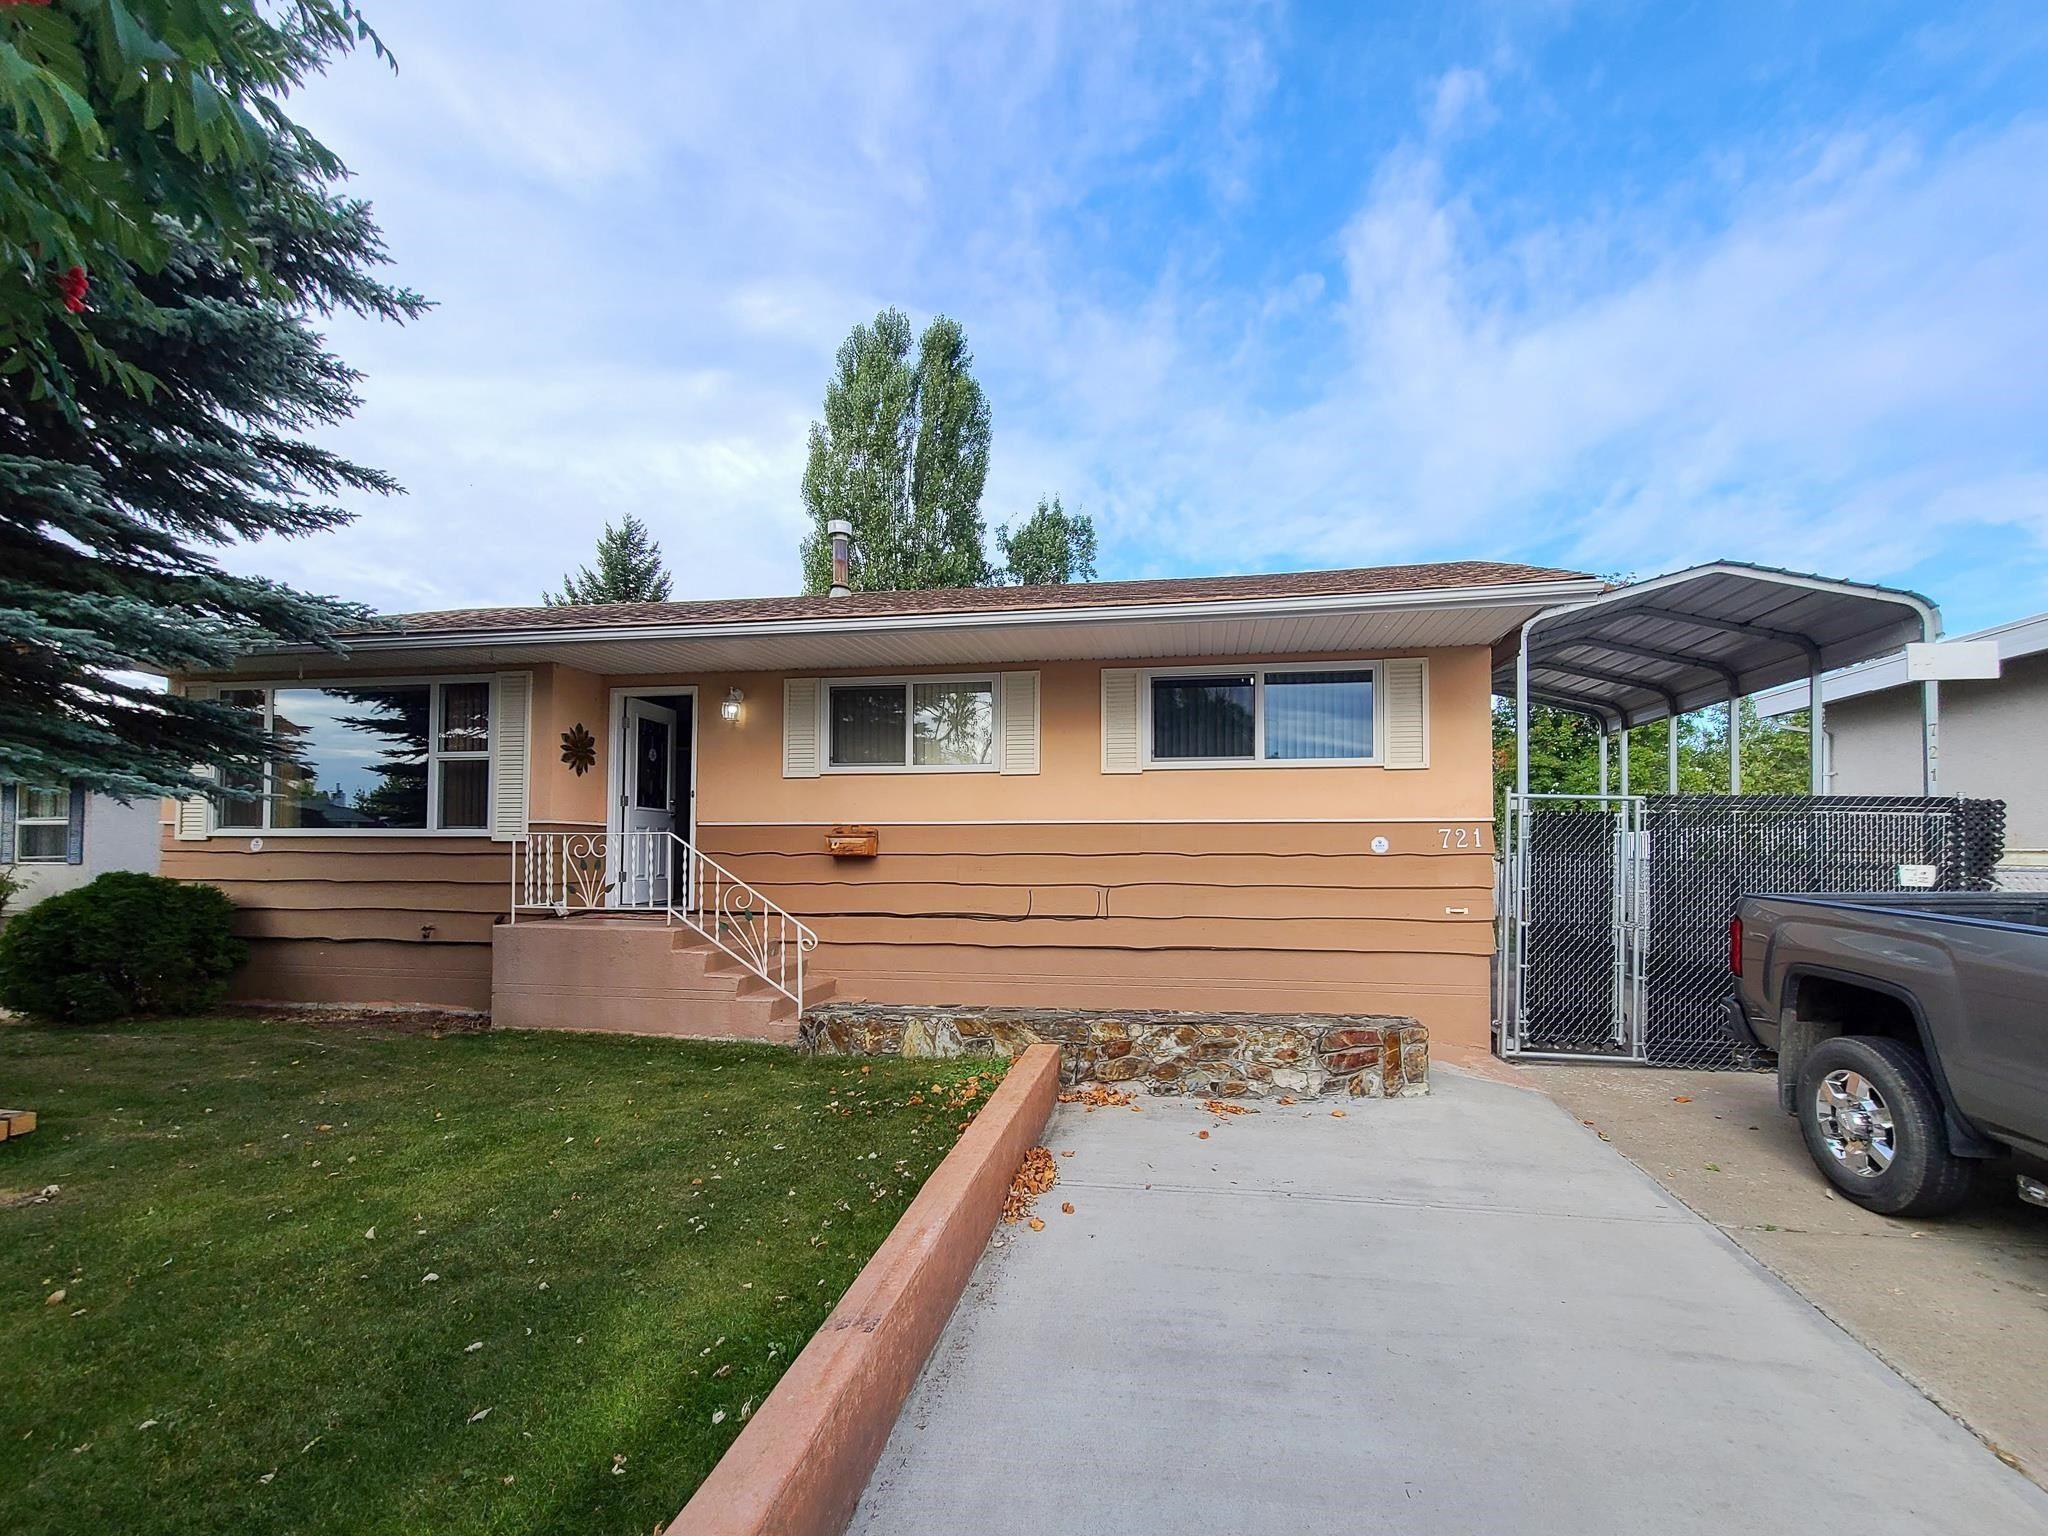 "Main Photo: 721 VEDDER Crescent: Spruceland House for sale in ""SPRUCELAND"" (PG City West (Zone 71))  : MLS®# R2615564"